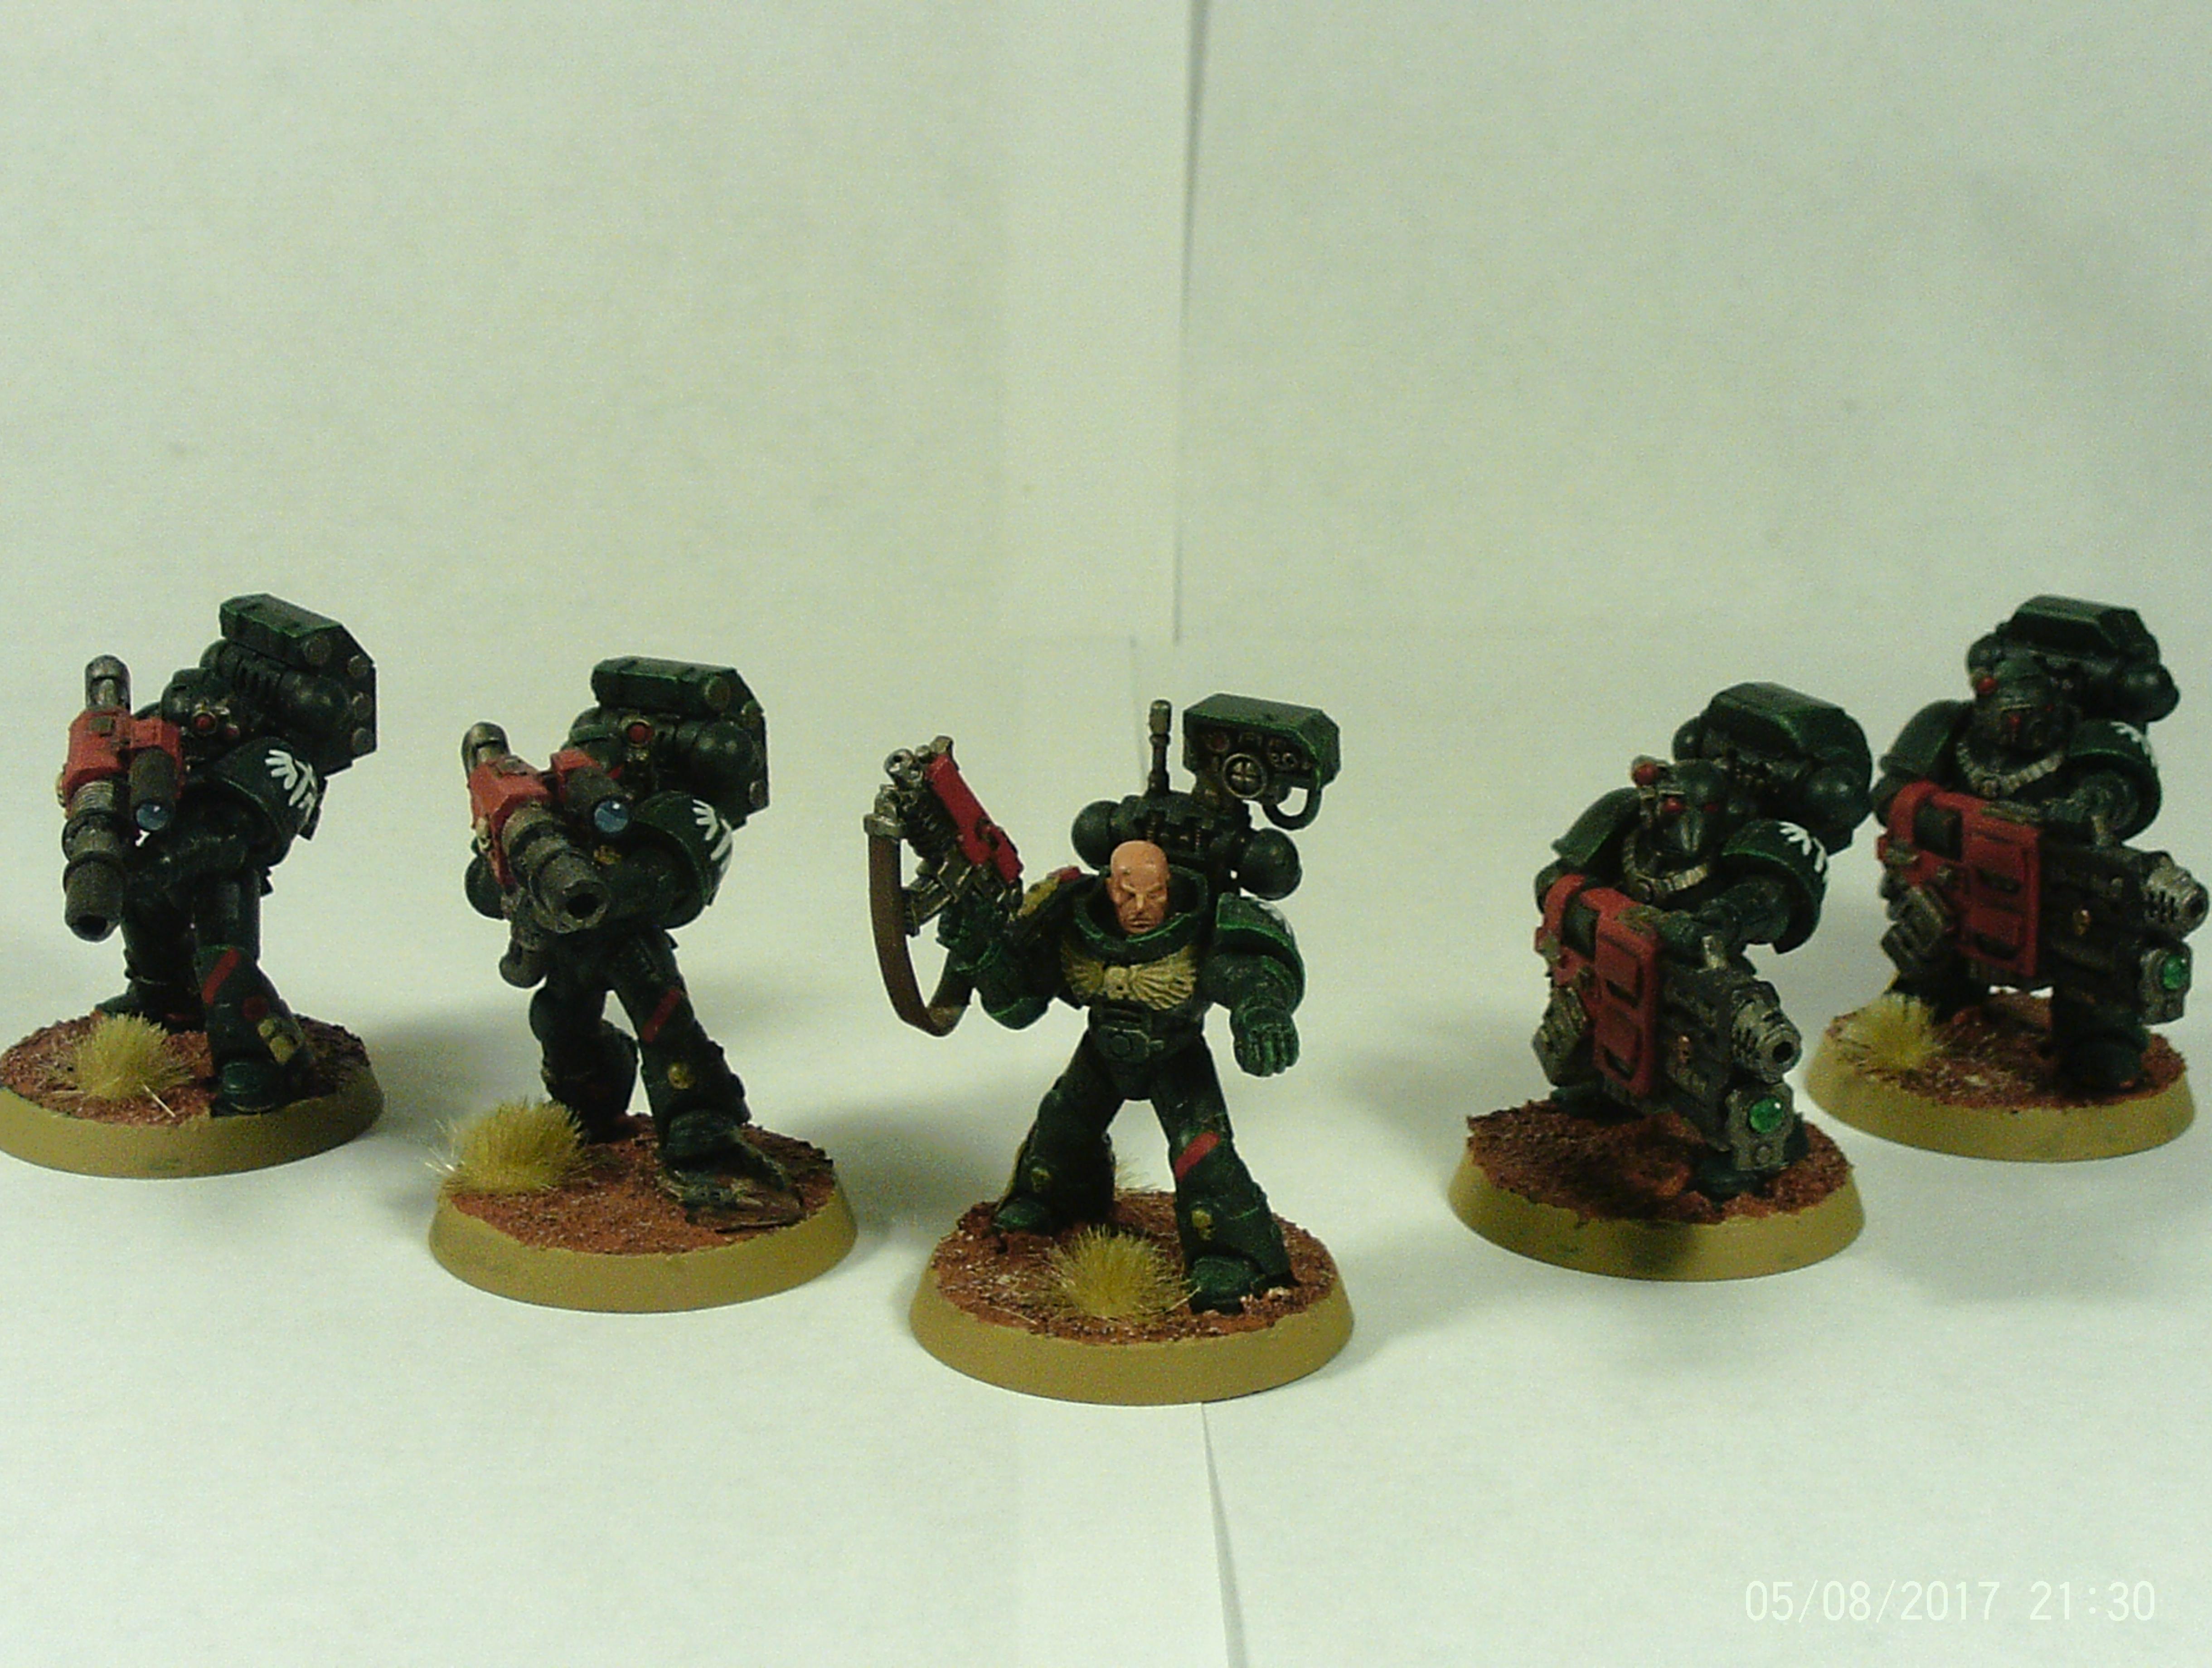 Angel, Cannon, Dark, Devastator, Grav, Heavy, Lascannon, Sergeant, Space, Space Marines, Squad